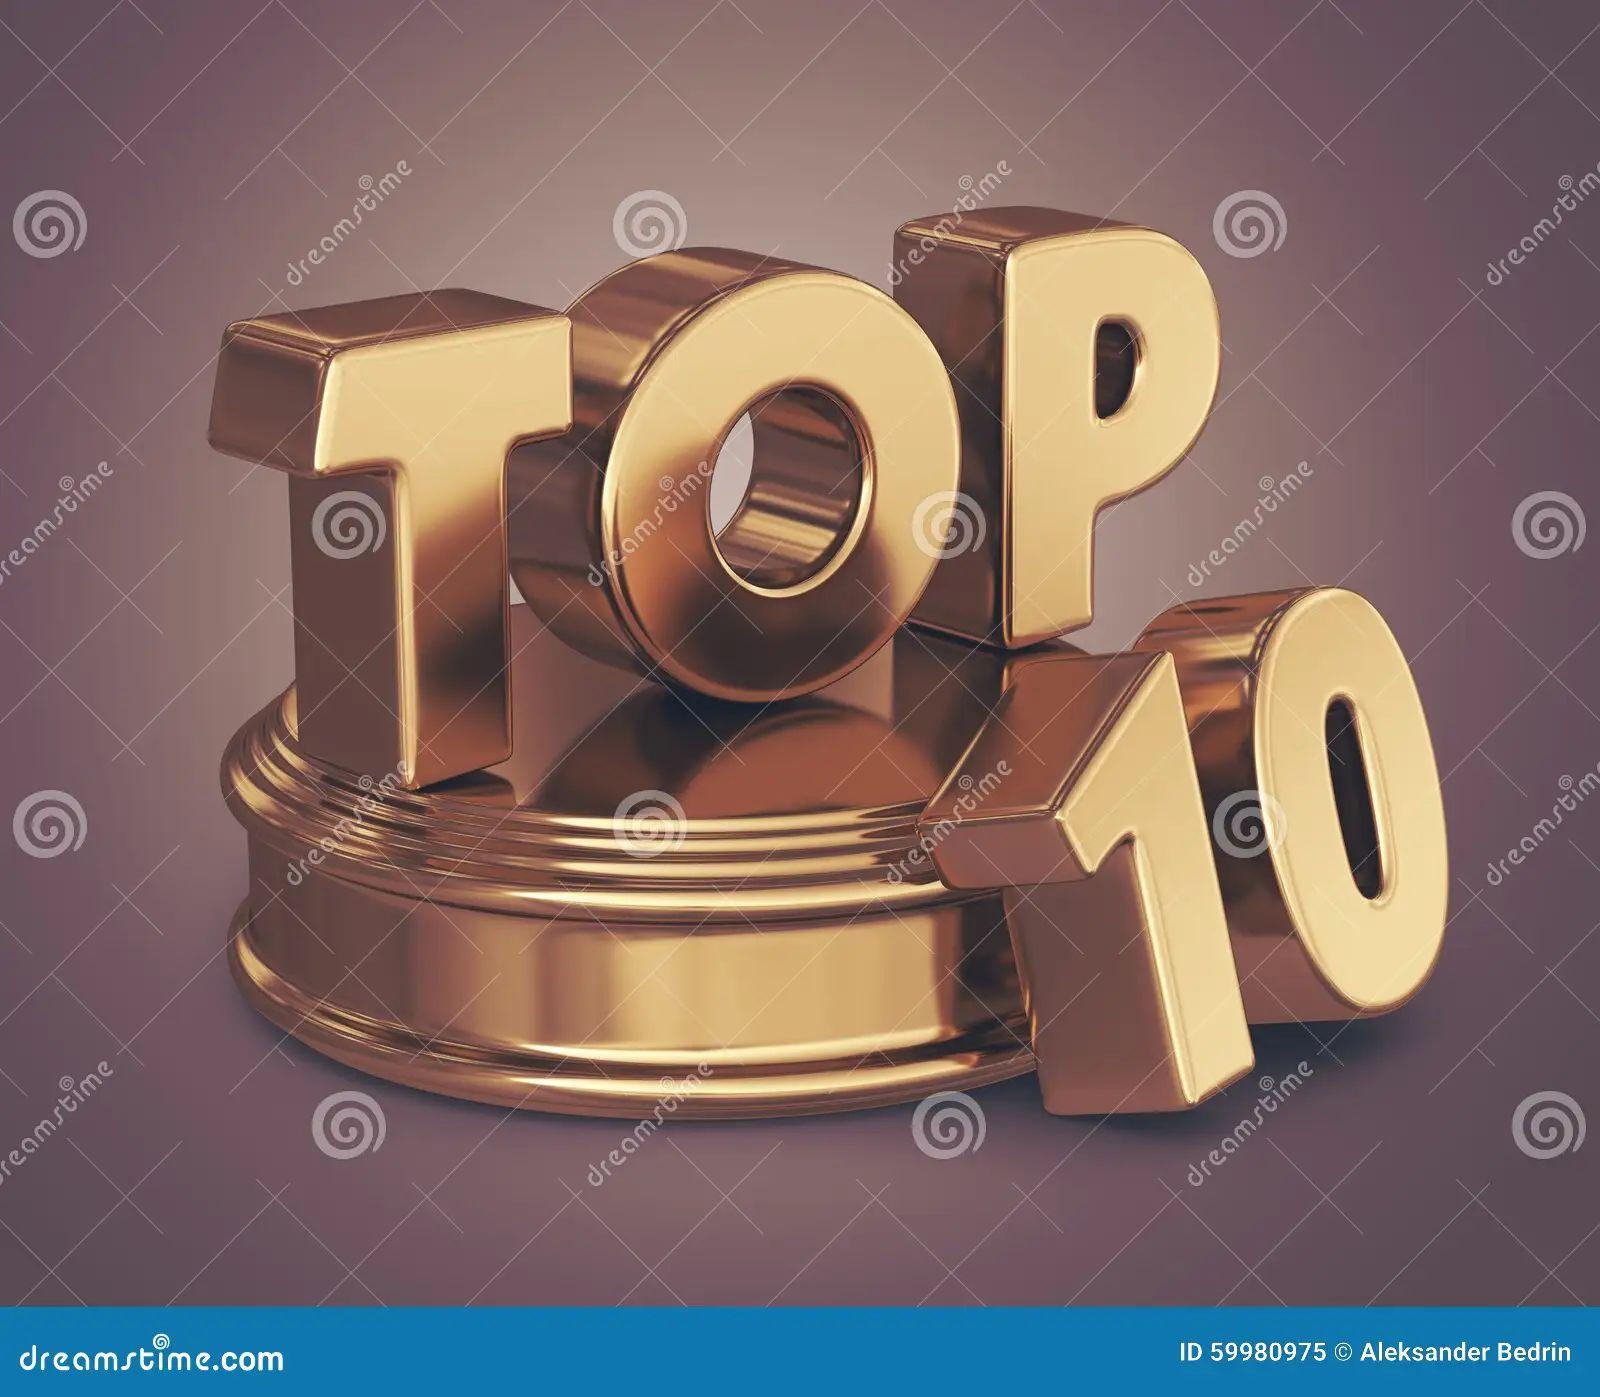 golden top 10 on podium 3d icon stock illustration